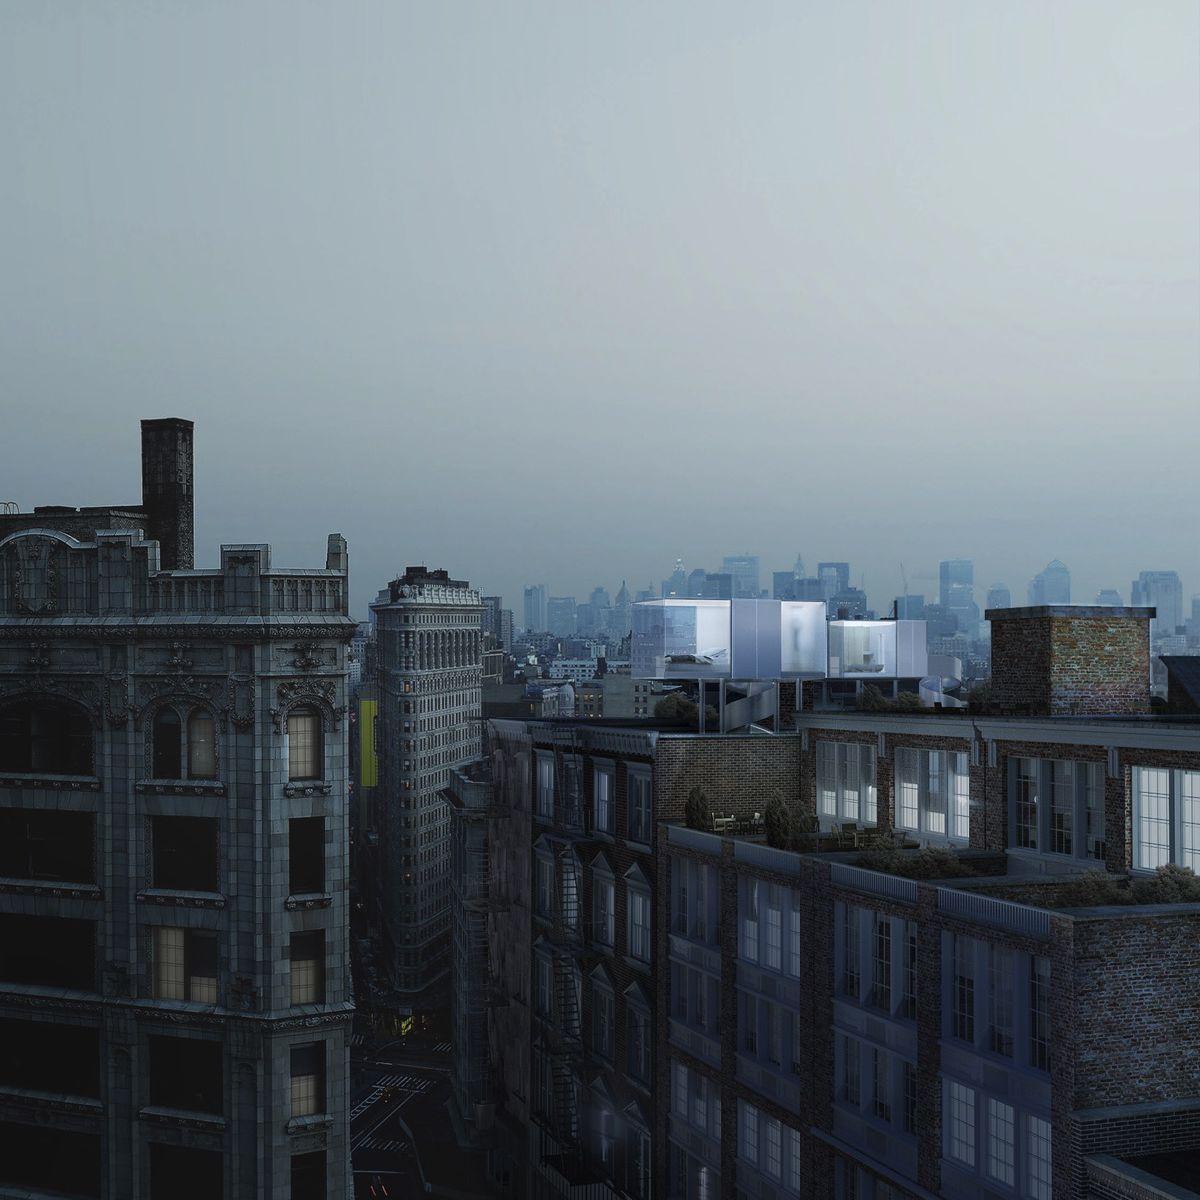 rooftop hotel rendering